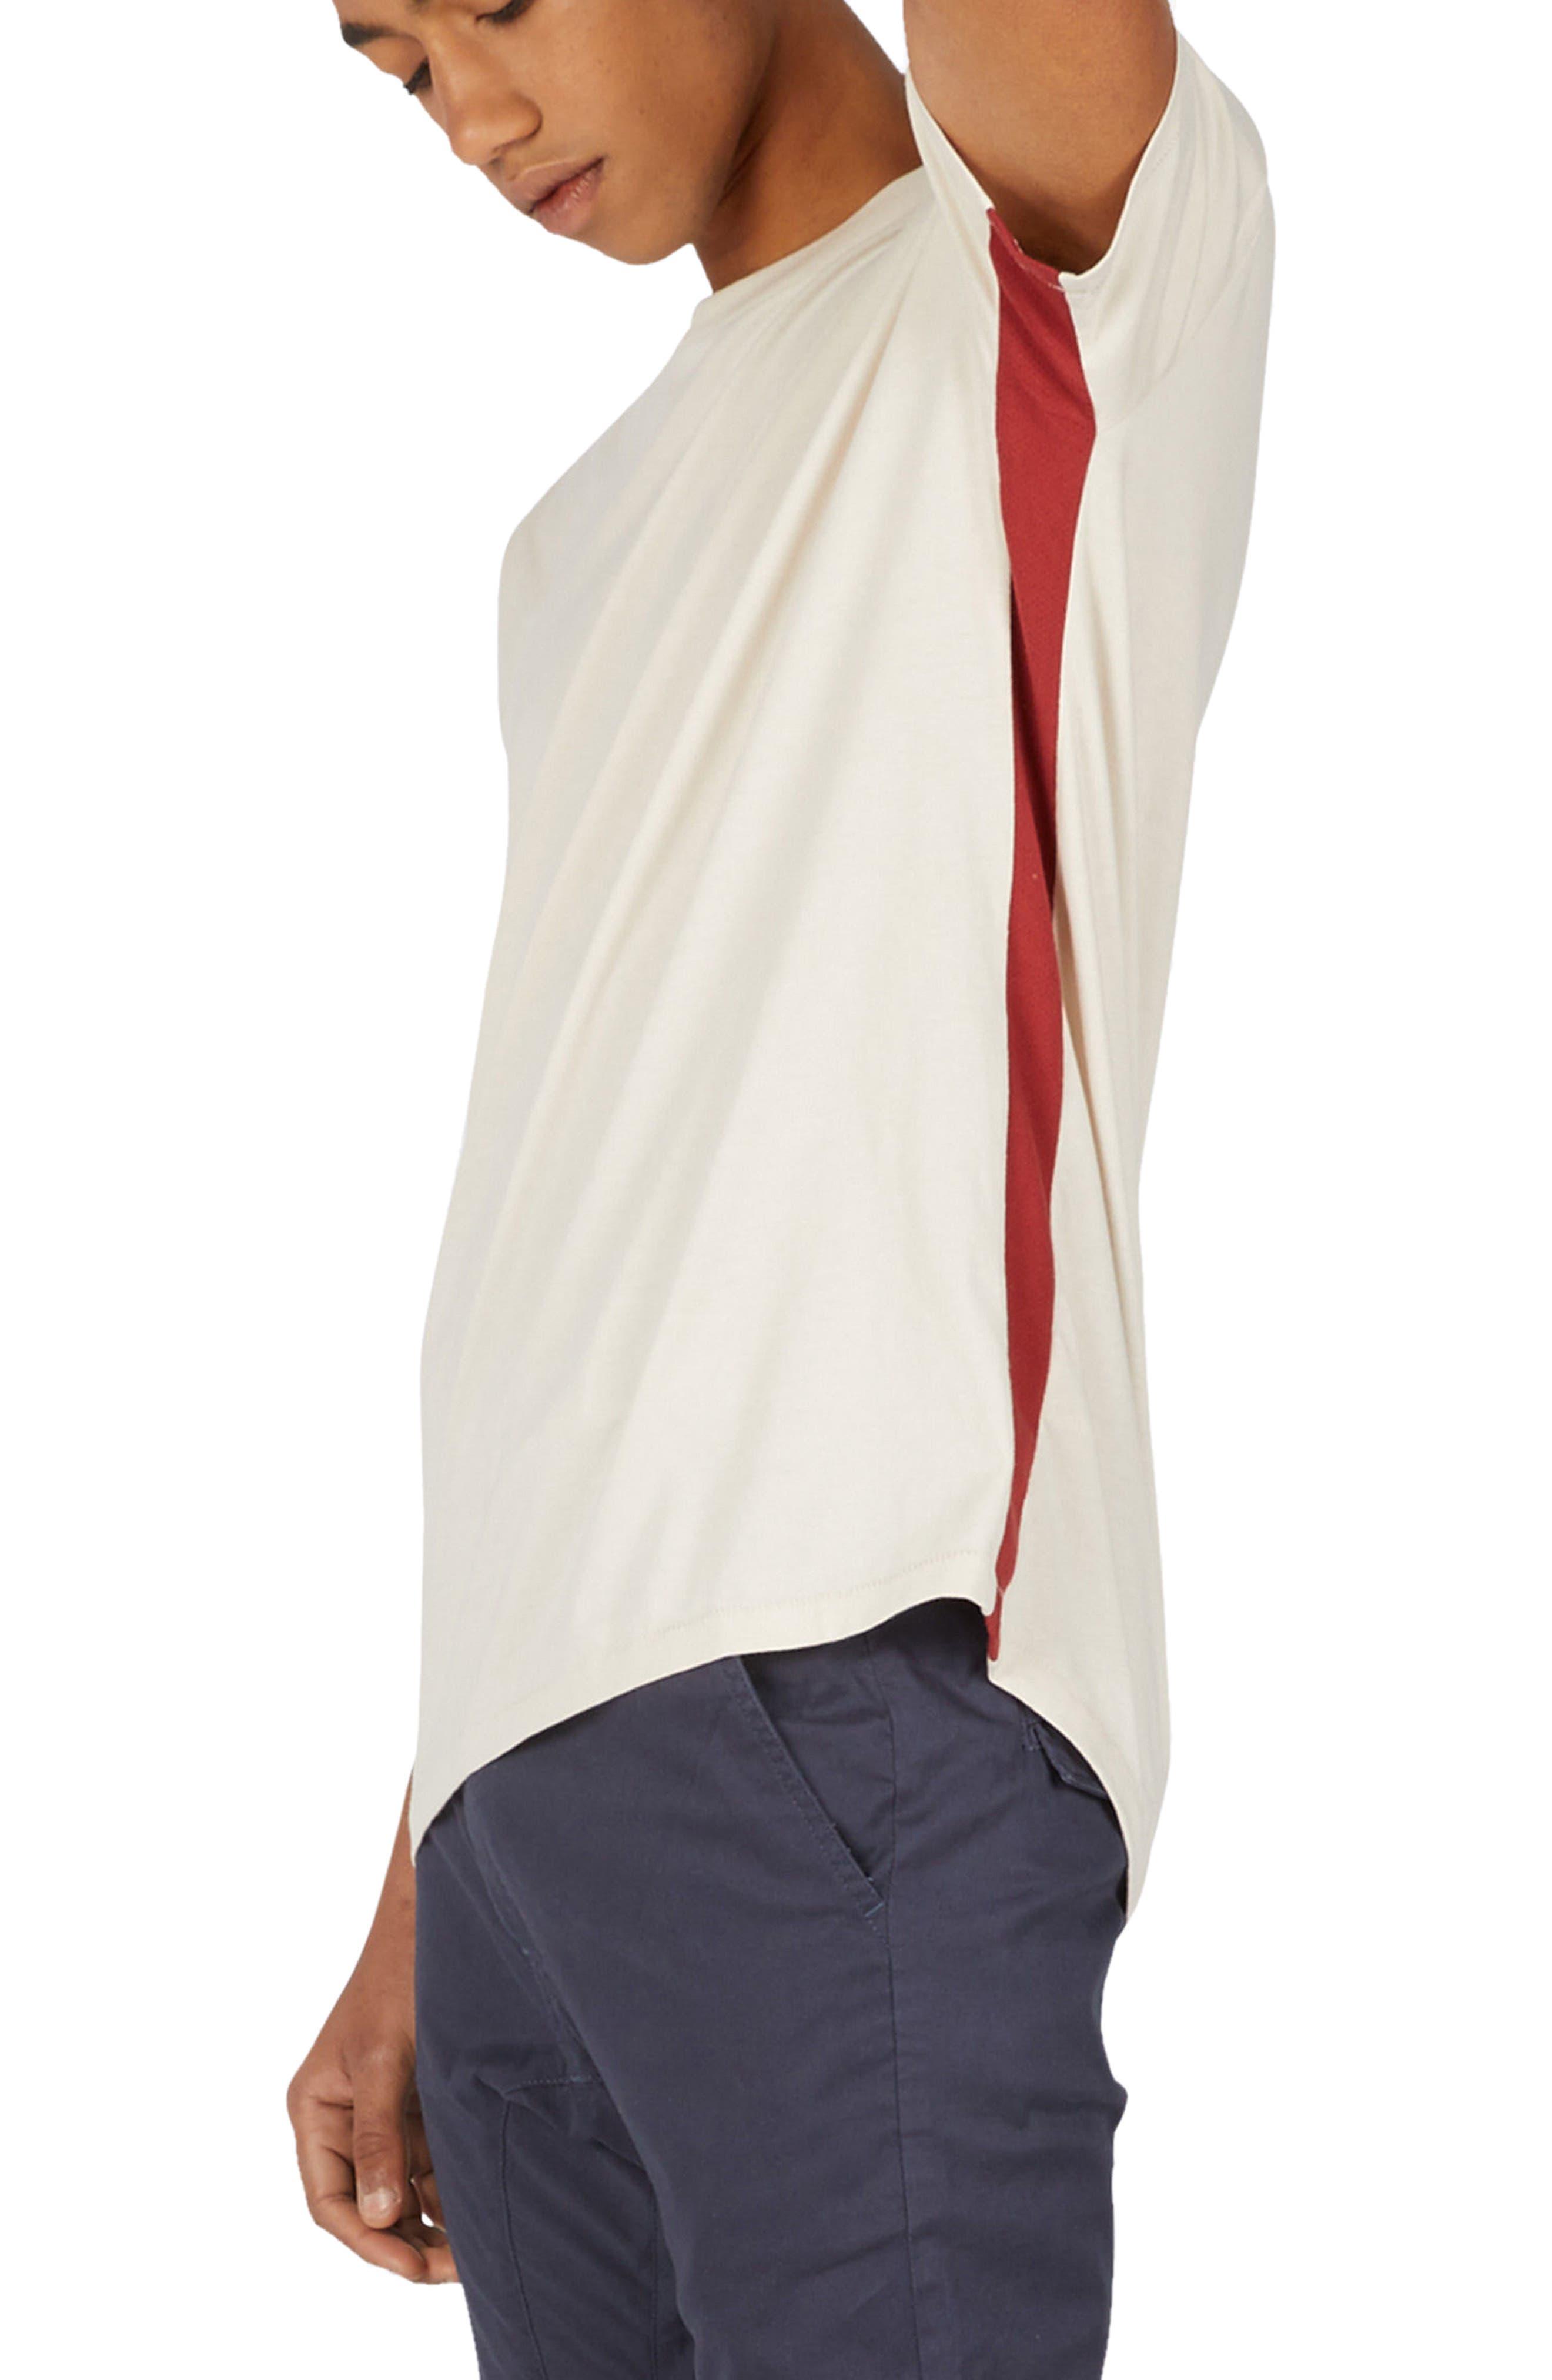 Sideline Rugger T-Shirt,                             Alternate thumbnail 4, color,                             Natural